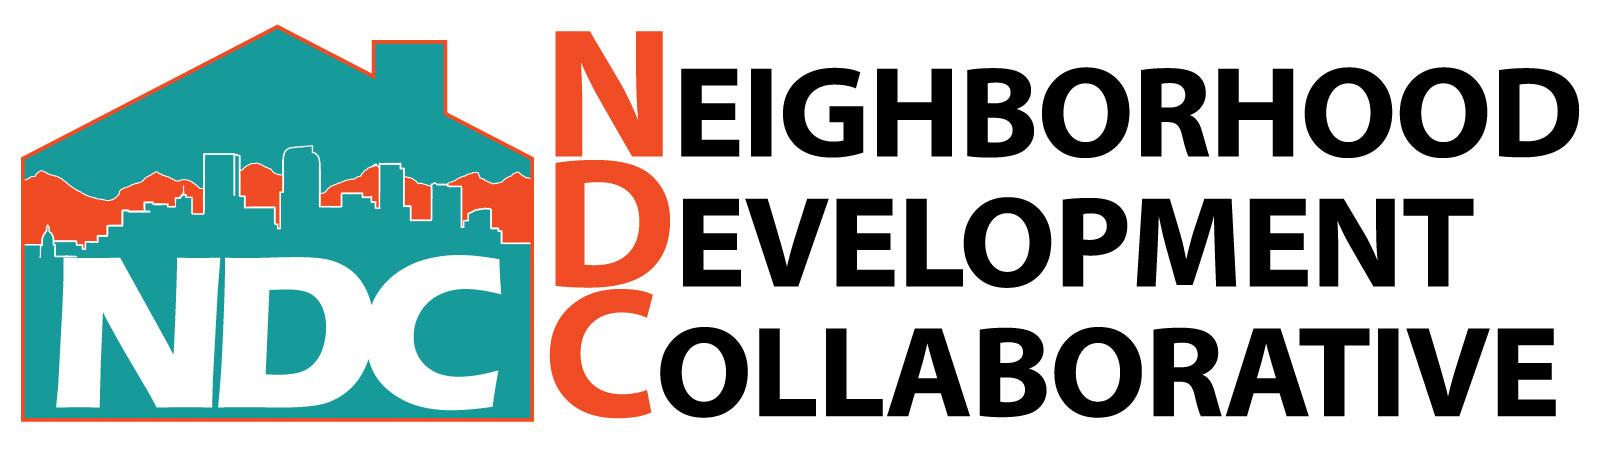 Partner Spotlight of the Month: Neighborhood Development Collaborative &  Jonathan Cappelli - Urban Land Conservancy